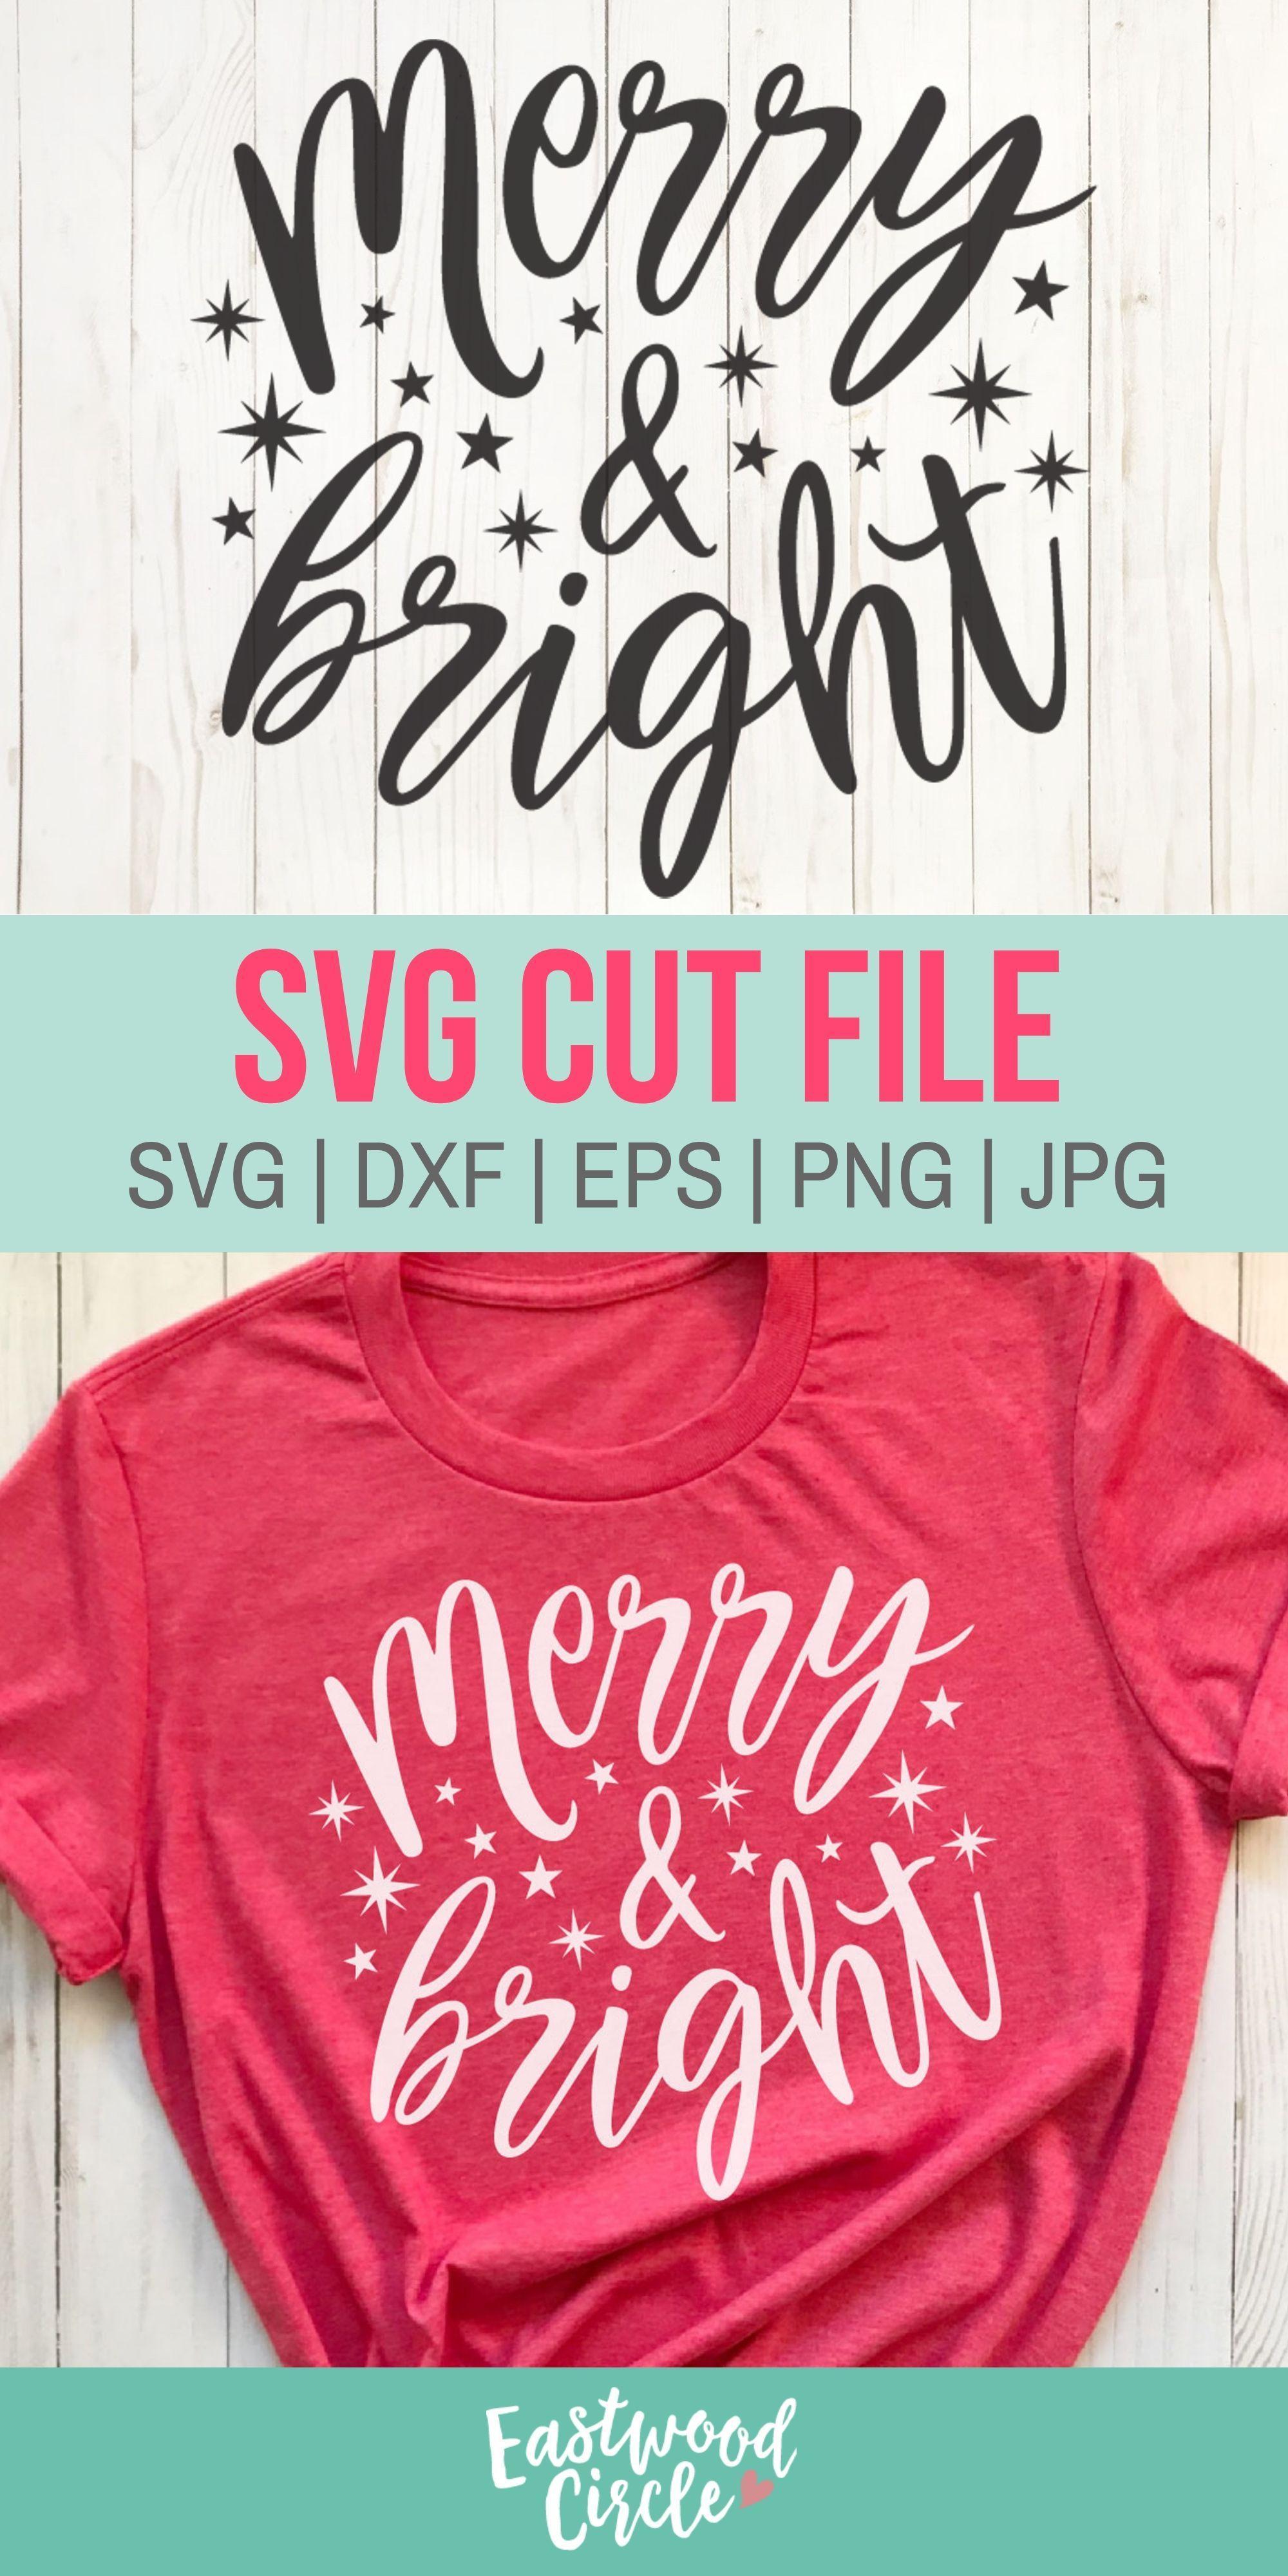 Merry and Bright svg, Christmas svg, Christmas Shirt svg